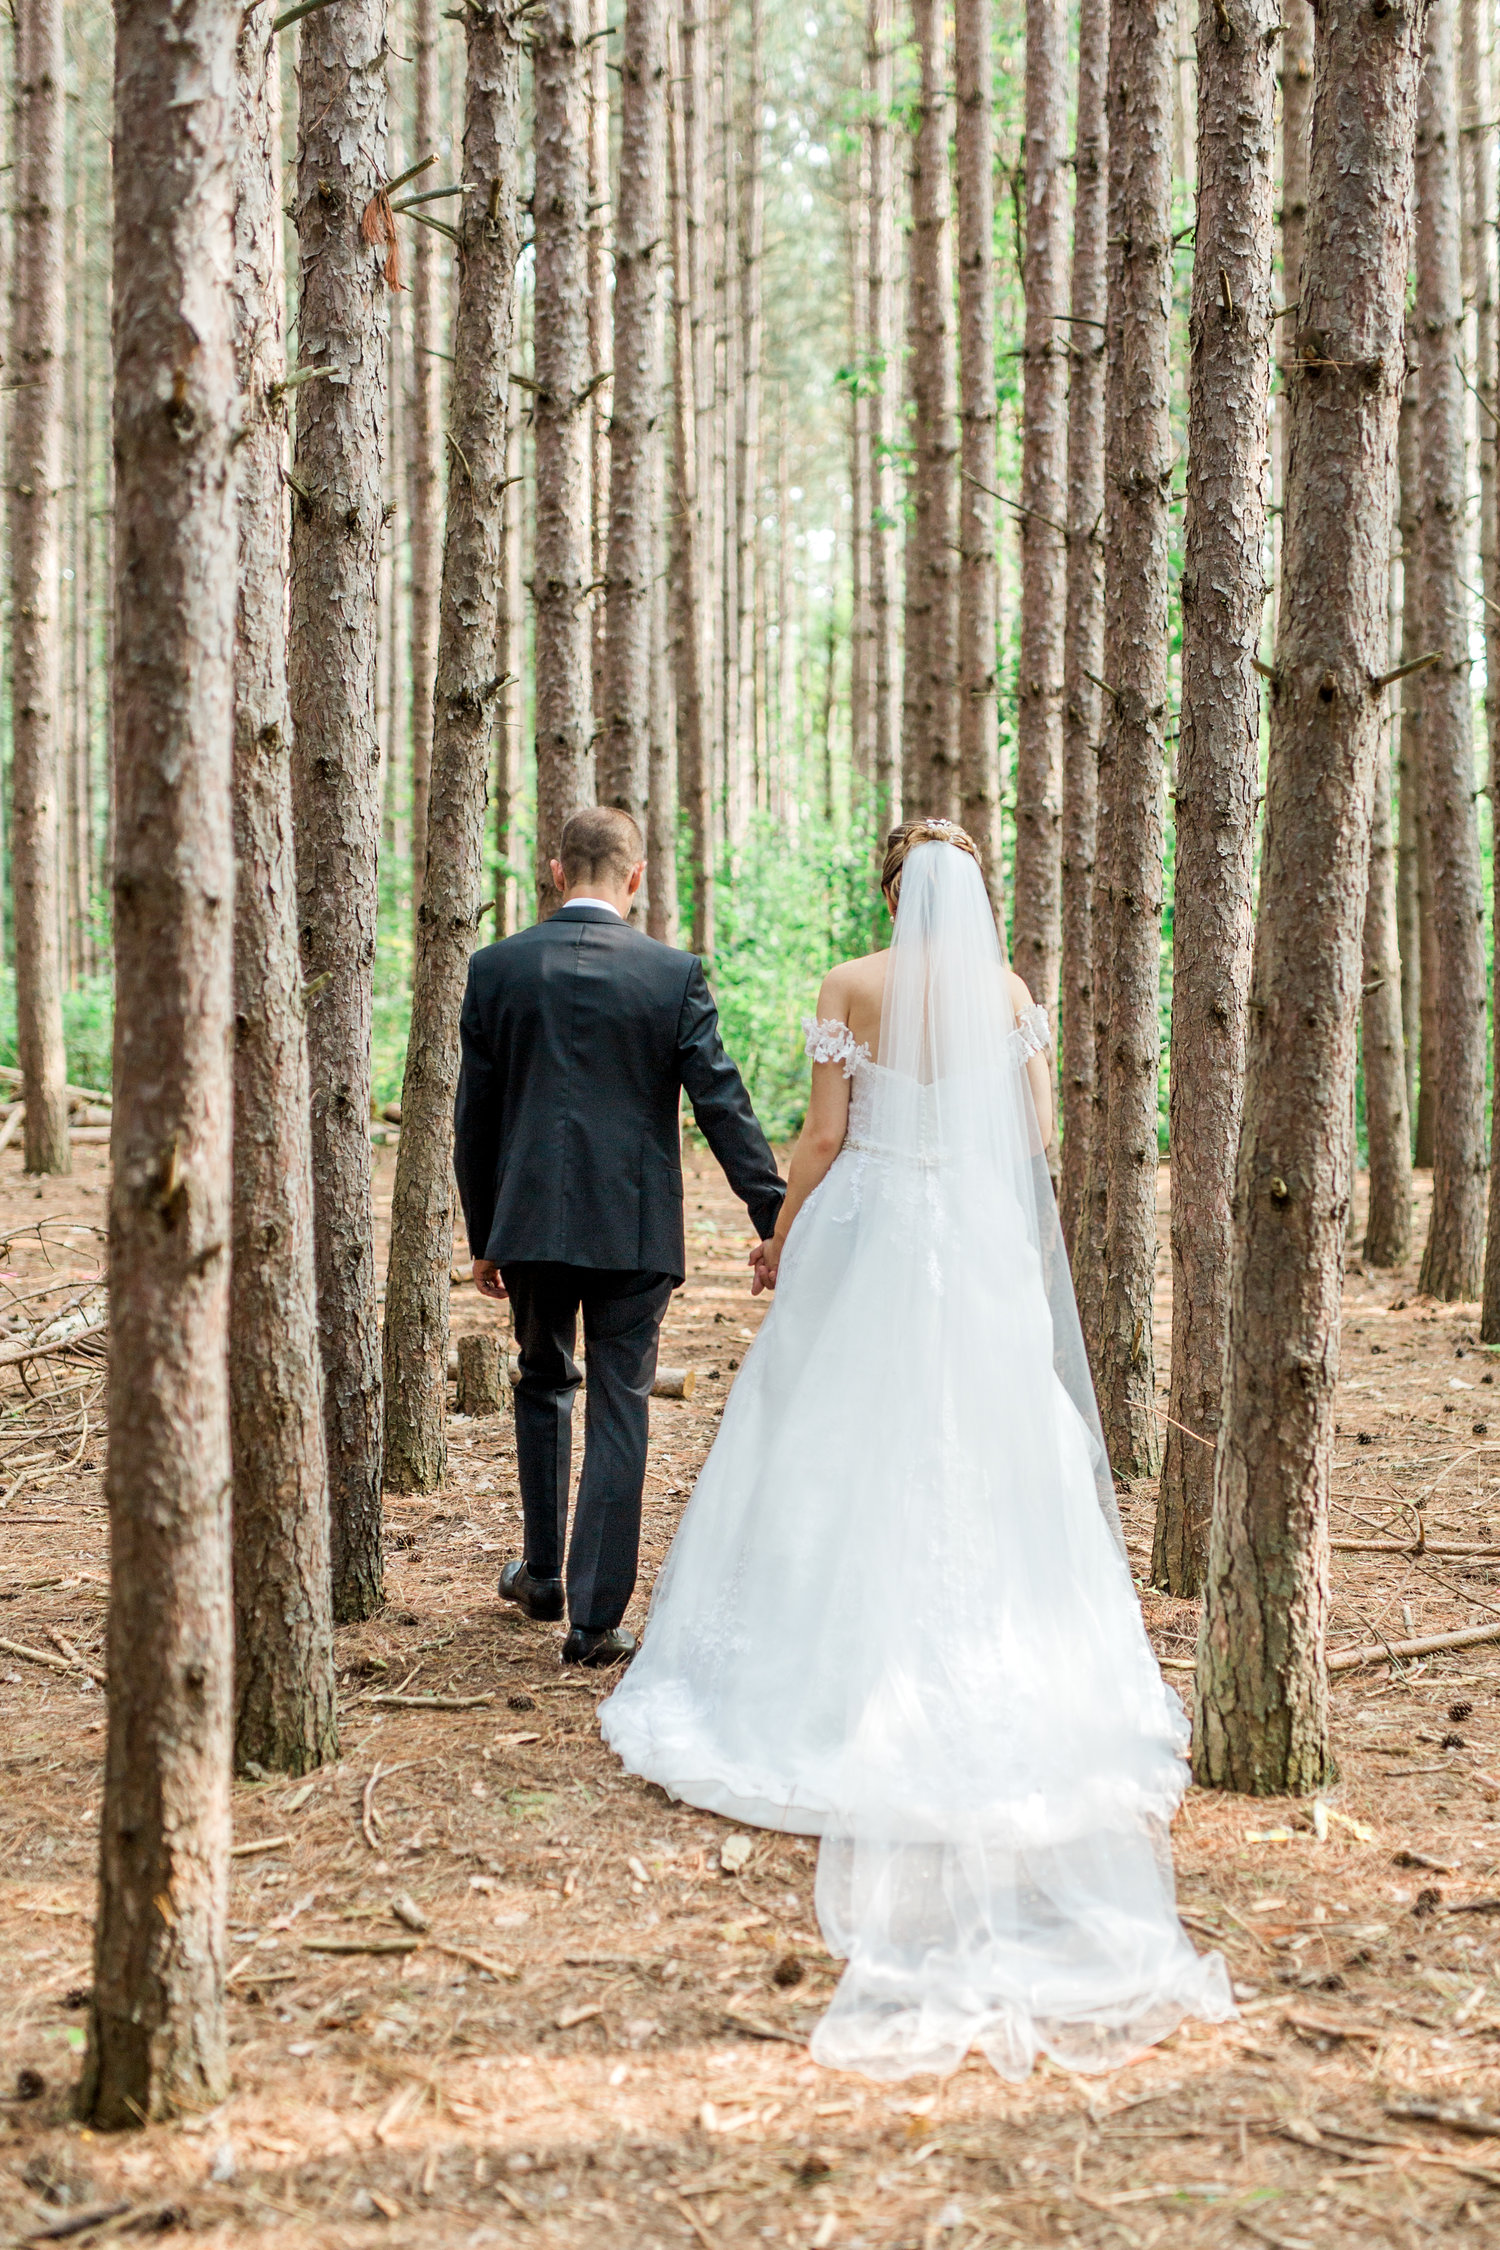 Danielle-Giroux-Amir-Golbazi-Toronto-Wedding-Photographer-Bellvue-Manor_DeLuca_1-812.jpg